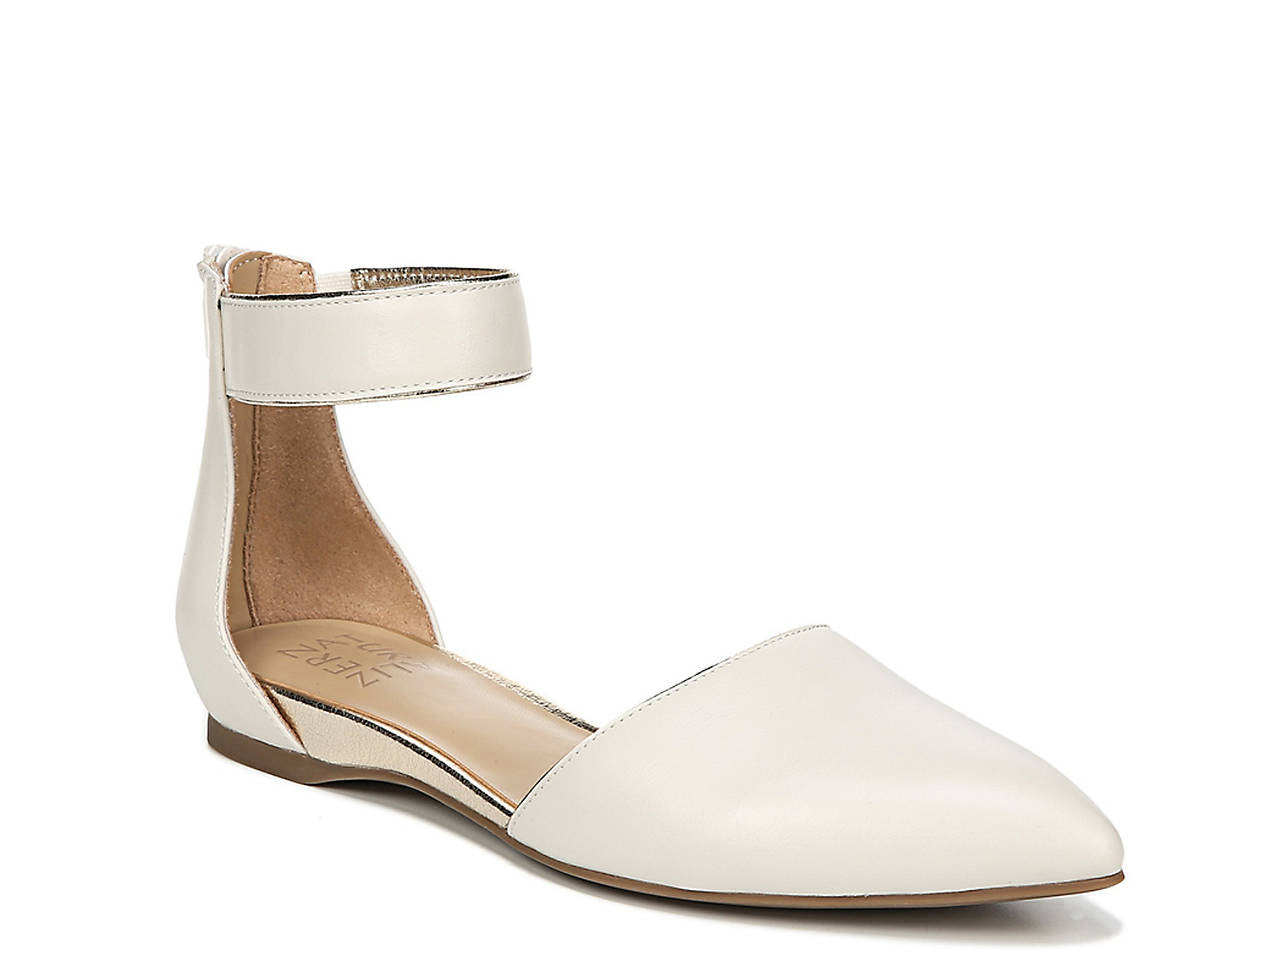 624b4a0b4b Naturalizer Trance Flat Women s Shoes